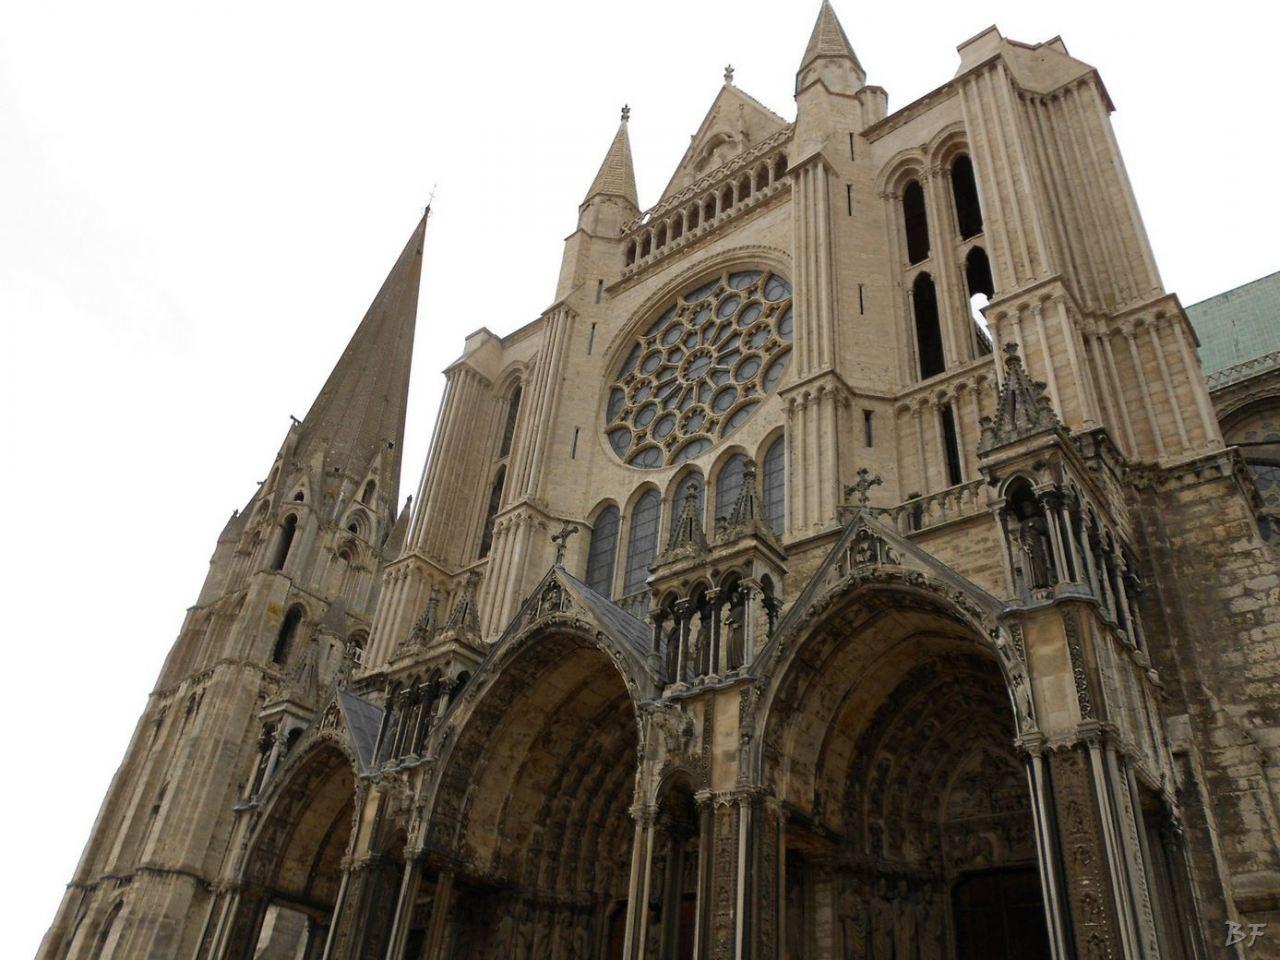 Cattedrale-Gotica-della-Vergine-Chartres-Eure-et-Loir-Centre-Val-de-Loire-Francia-16